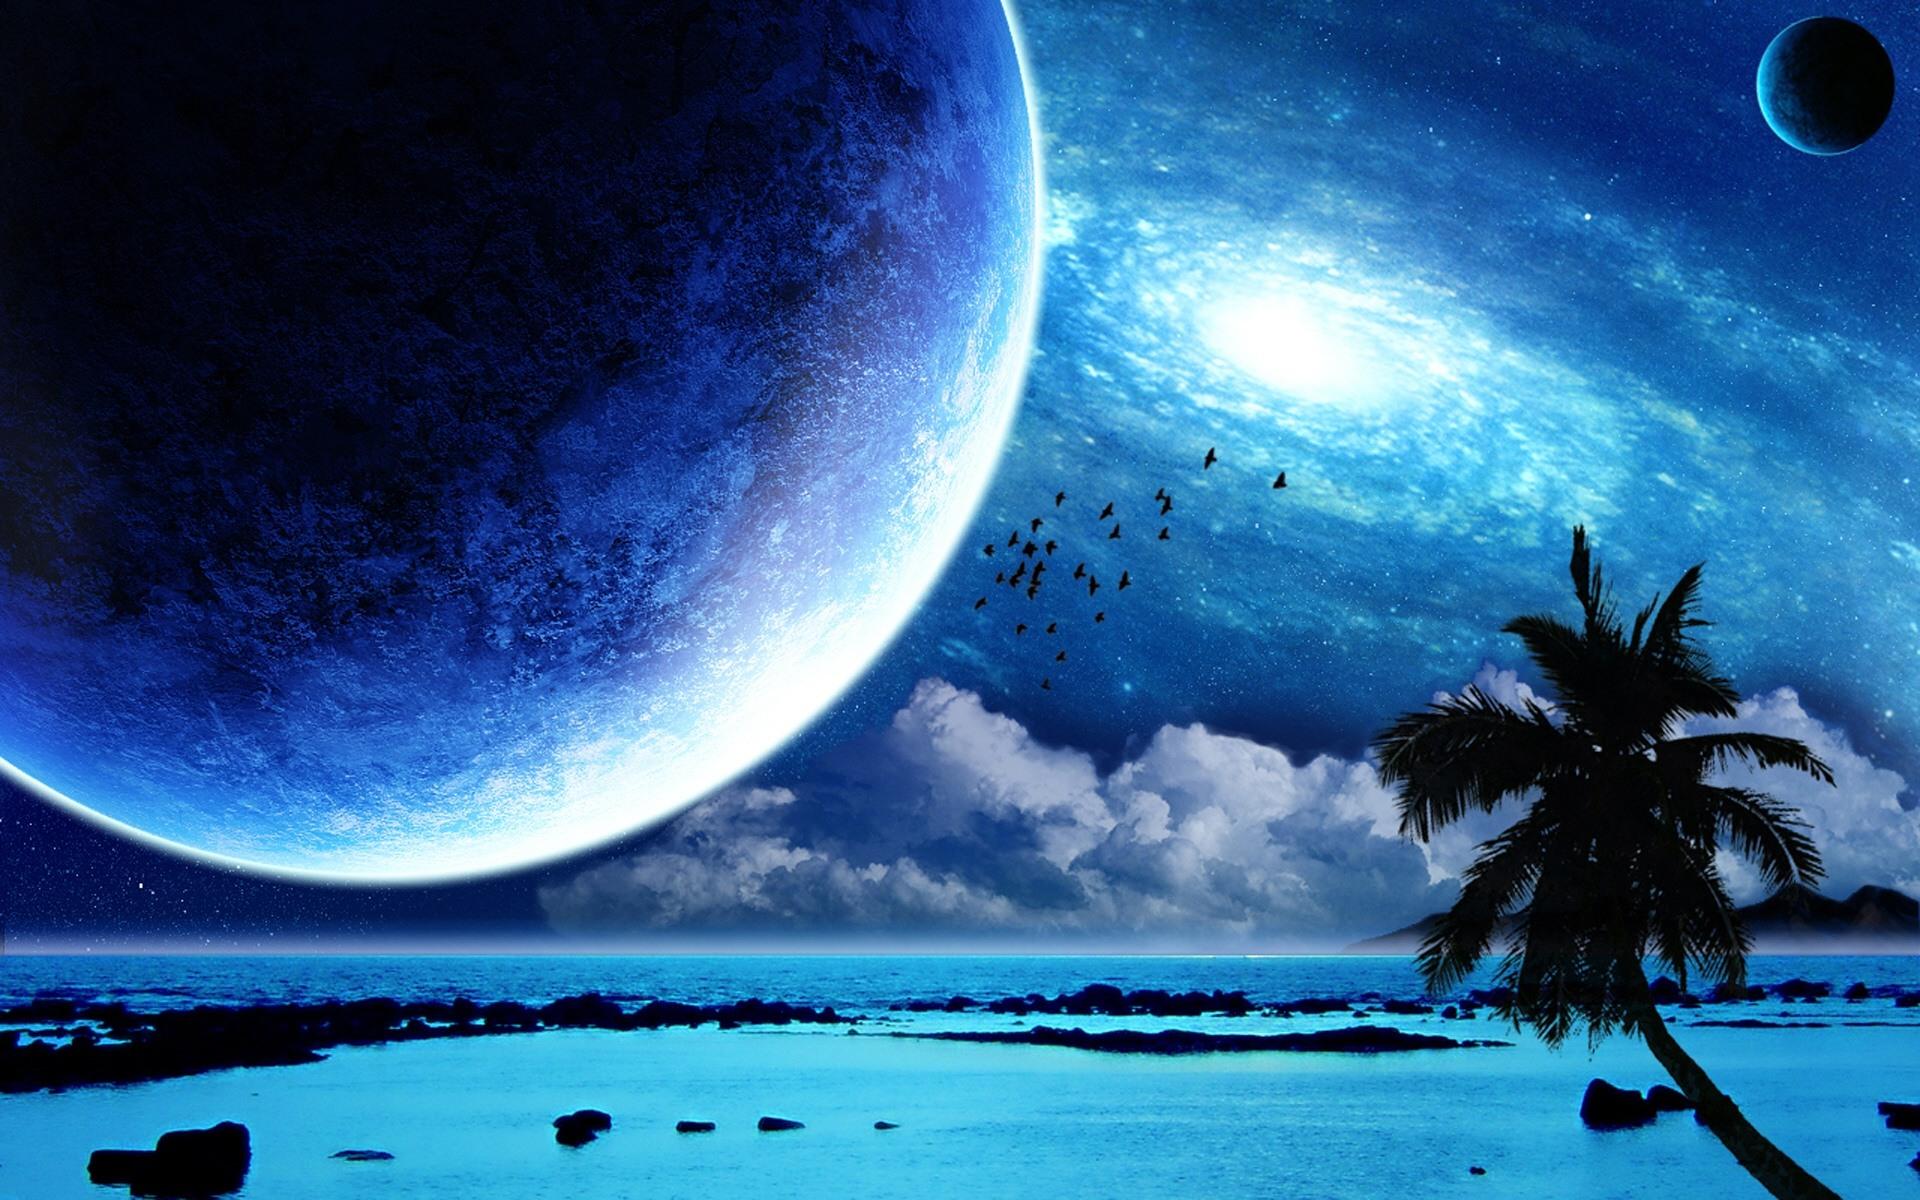 tropical, desktop, wallpaper, island, desktopia, bazzza, interstellar ...